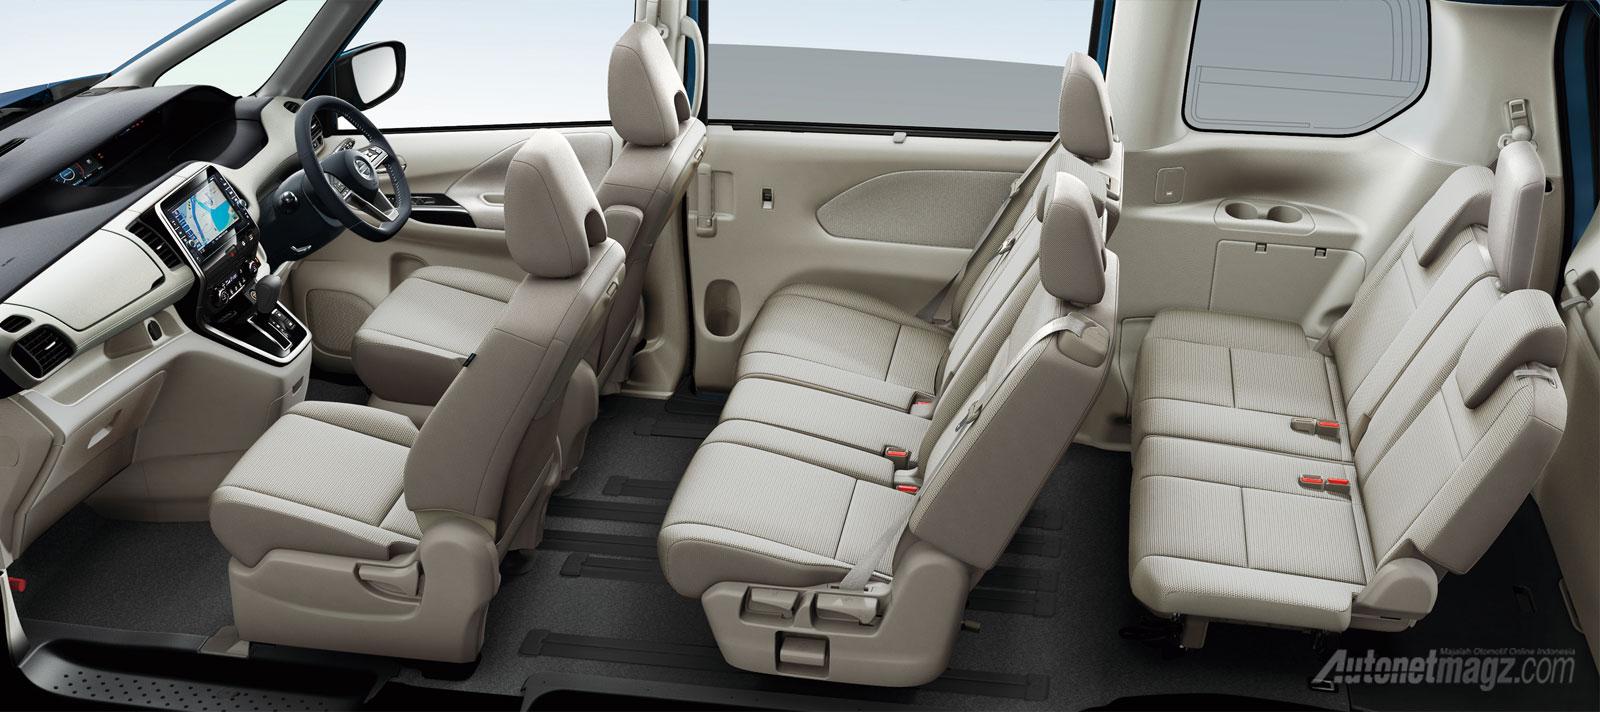 Interior New Nissan Serena C27 2017 kabin konfigurasi jok